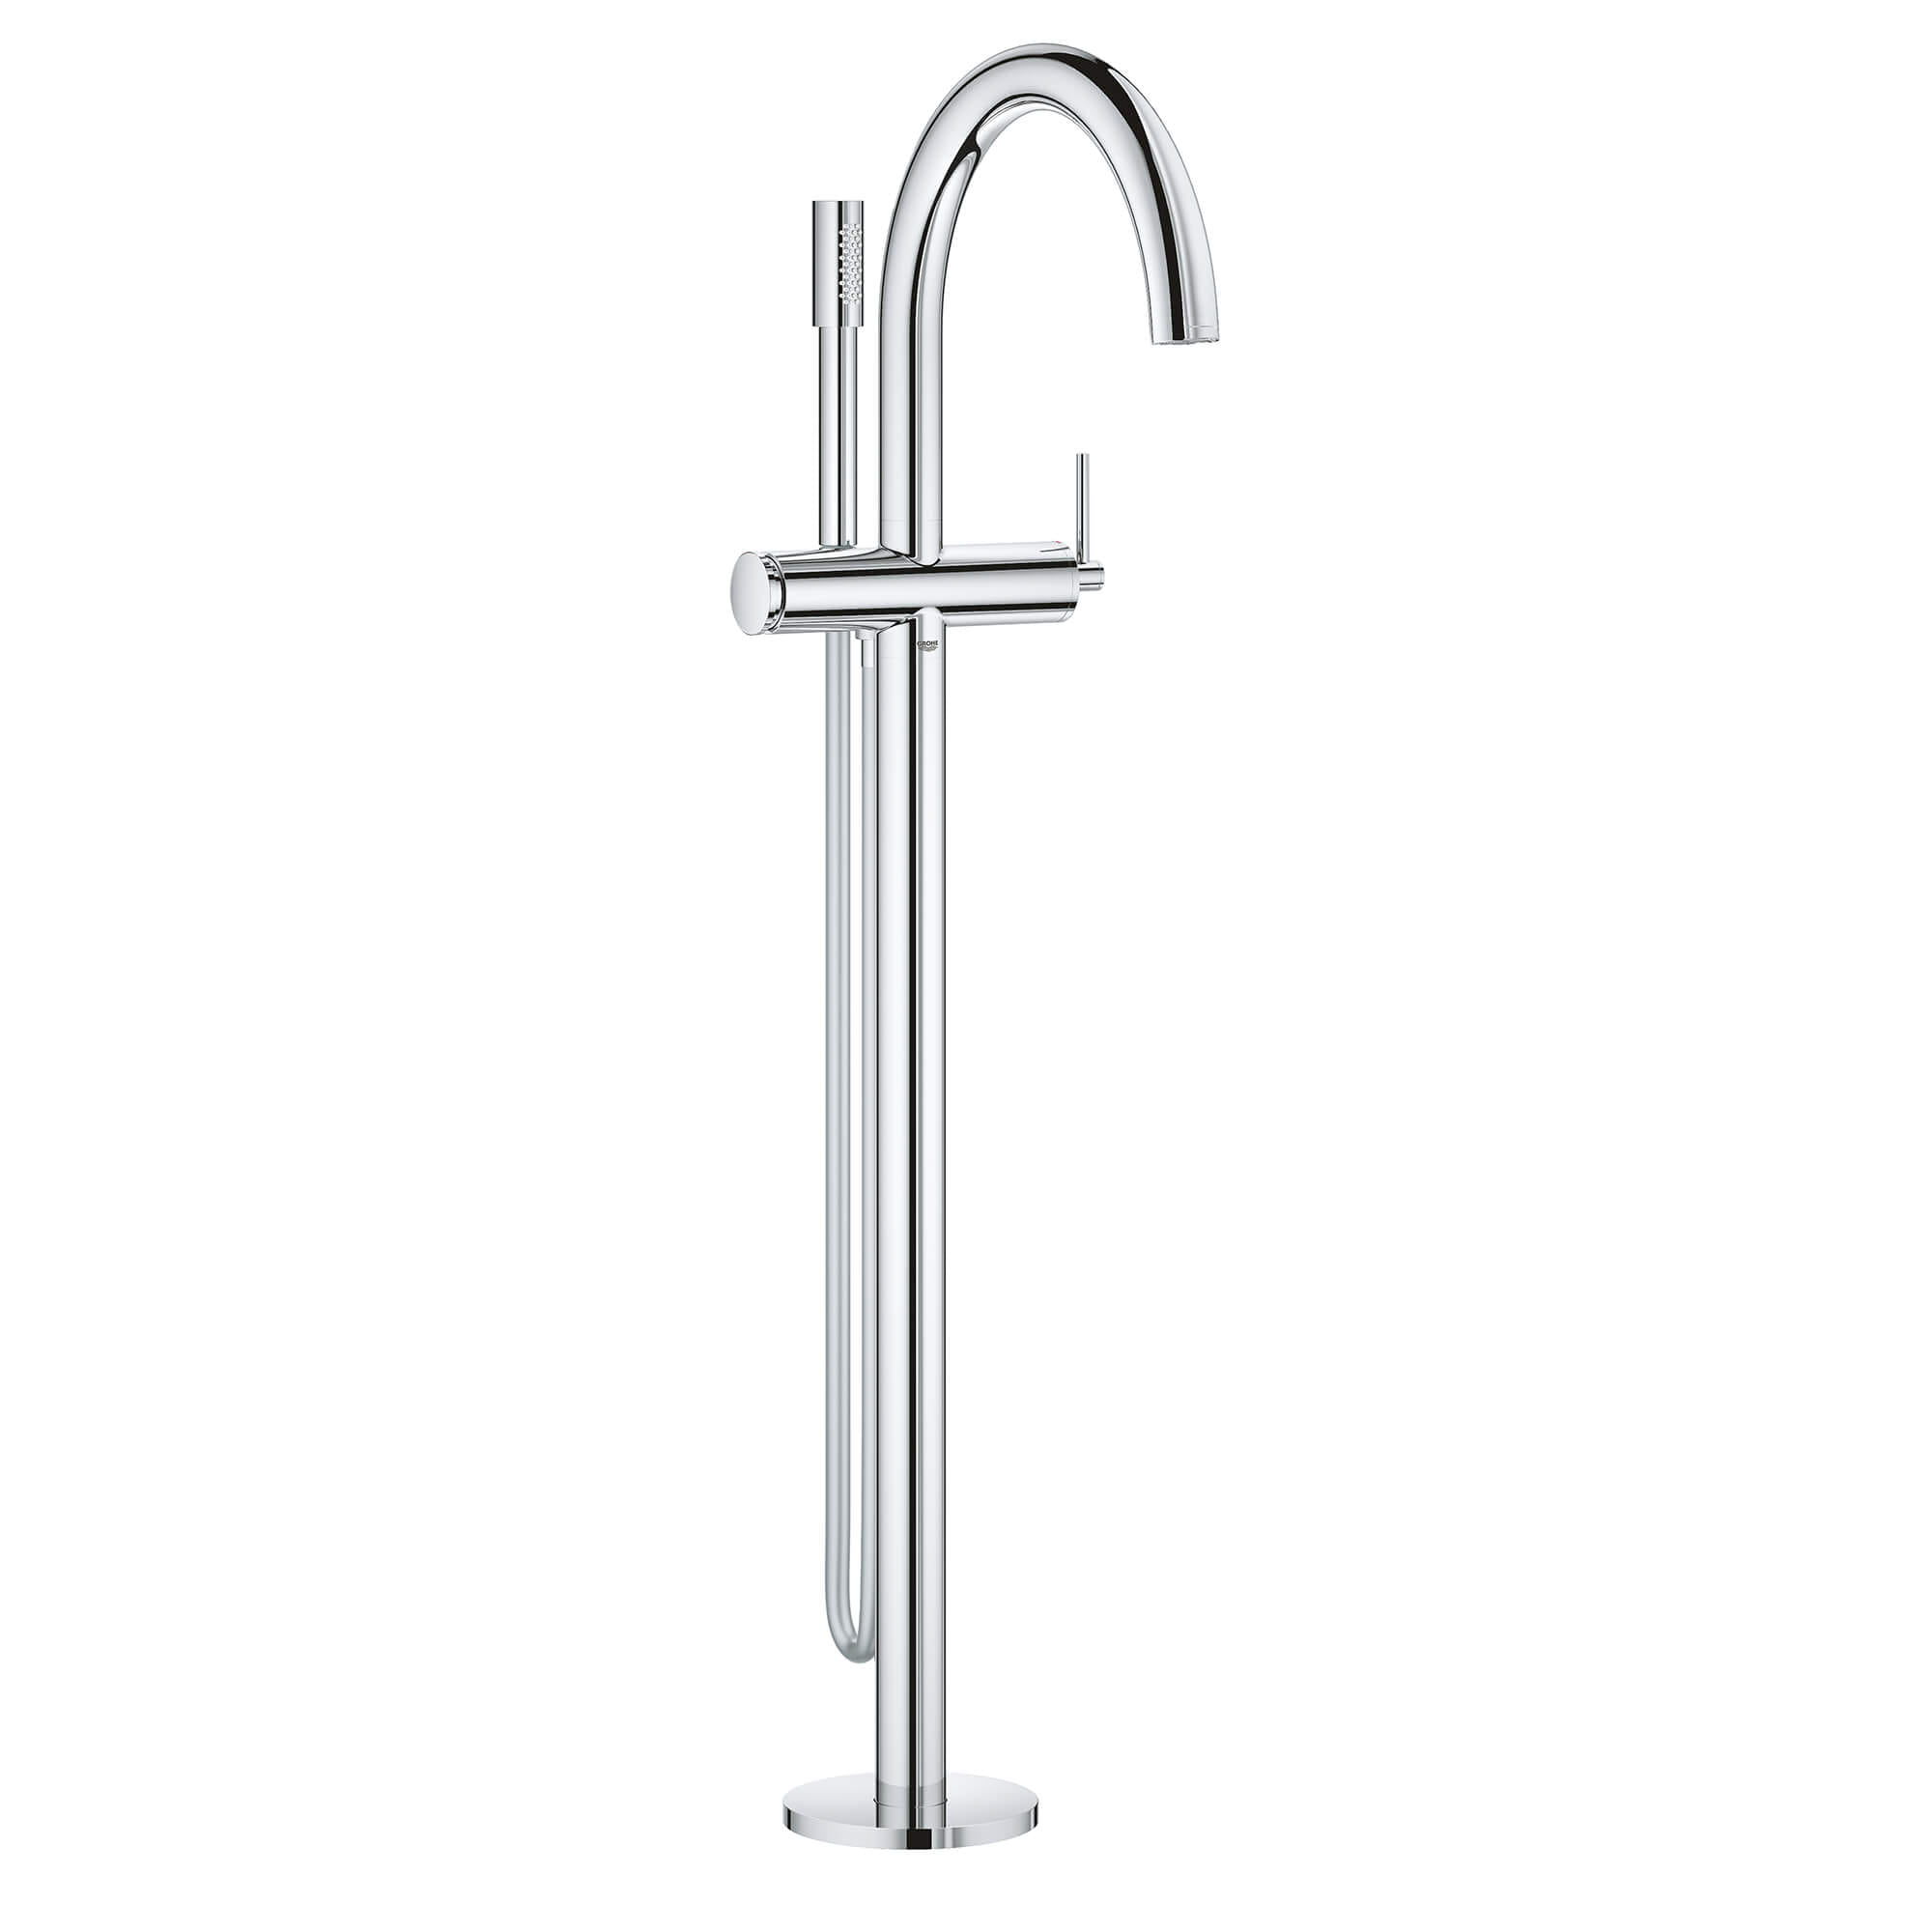 Chrom/é Grohe 33553003 Plumbing/_Fixture